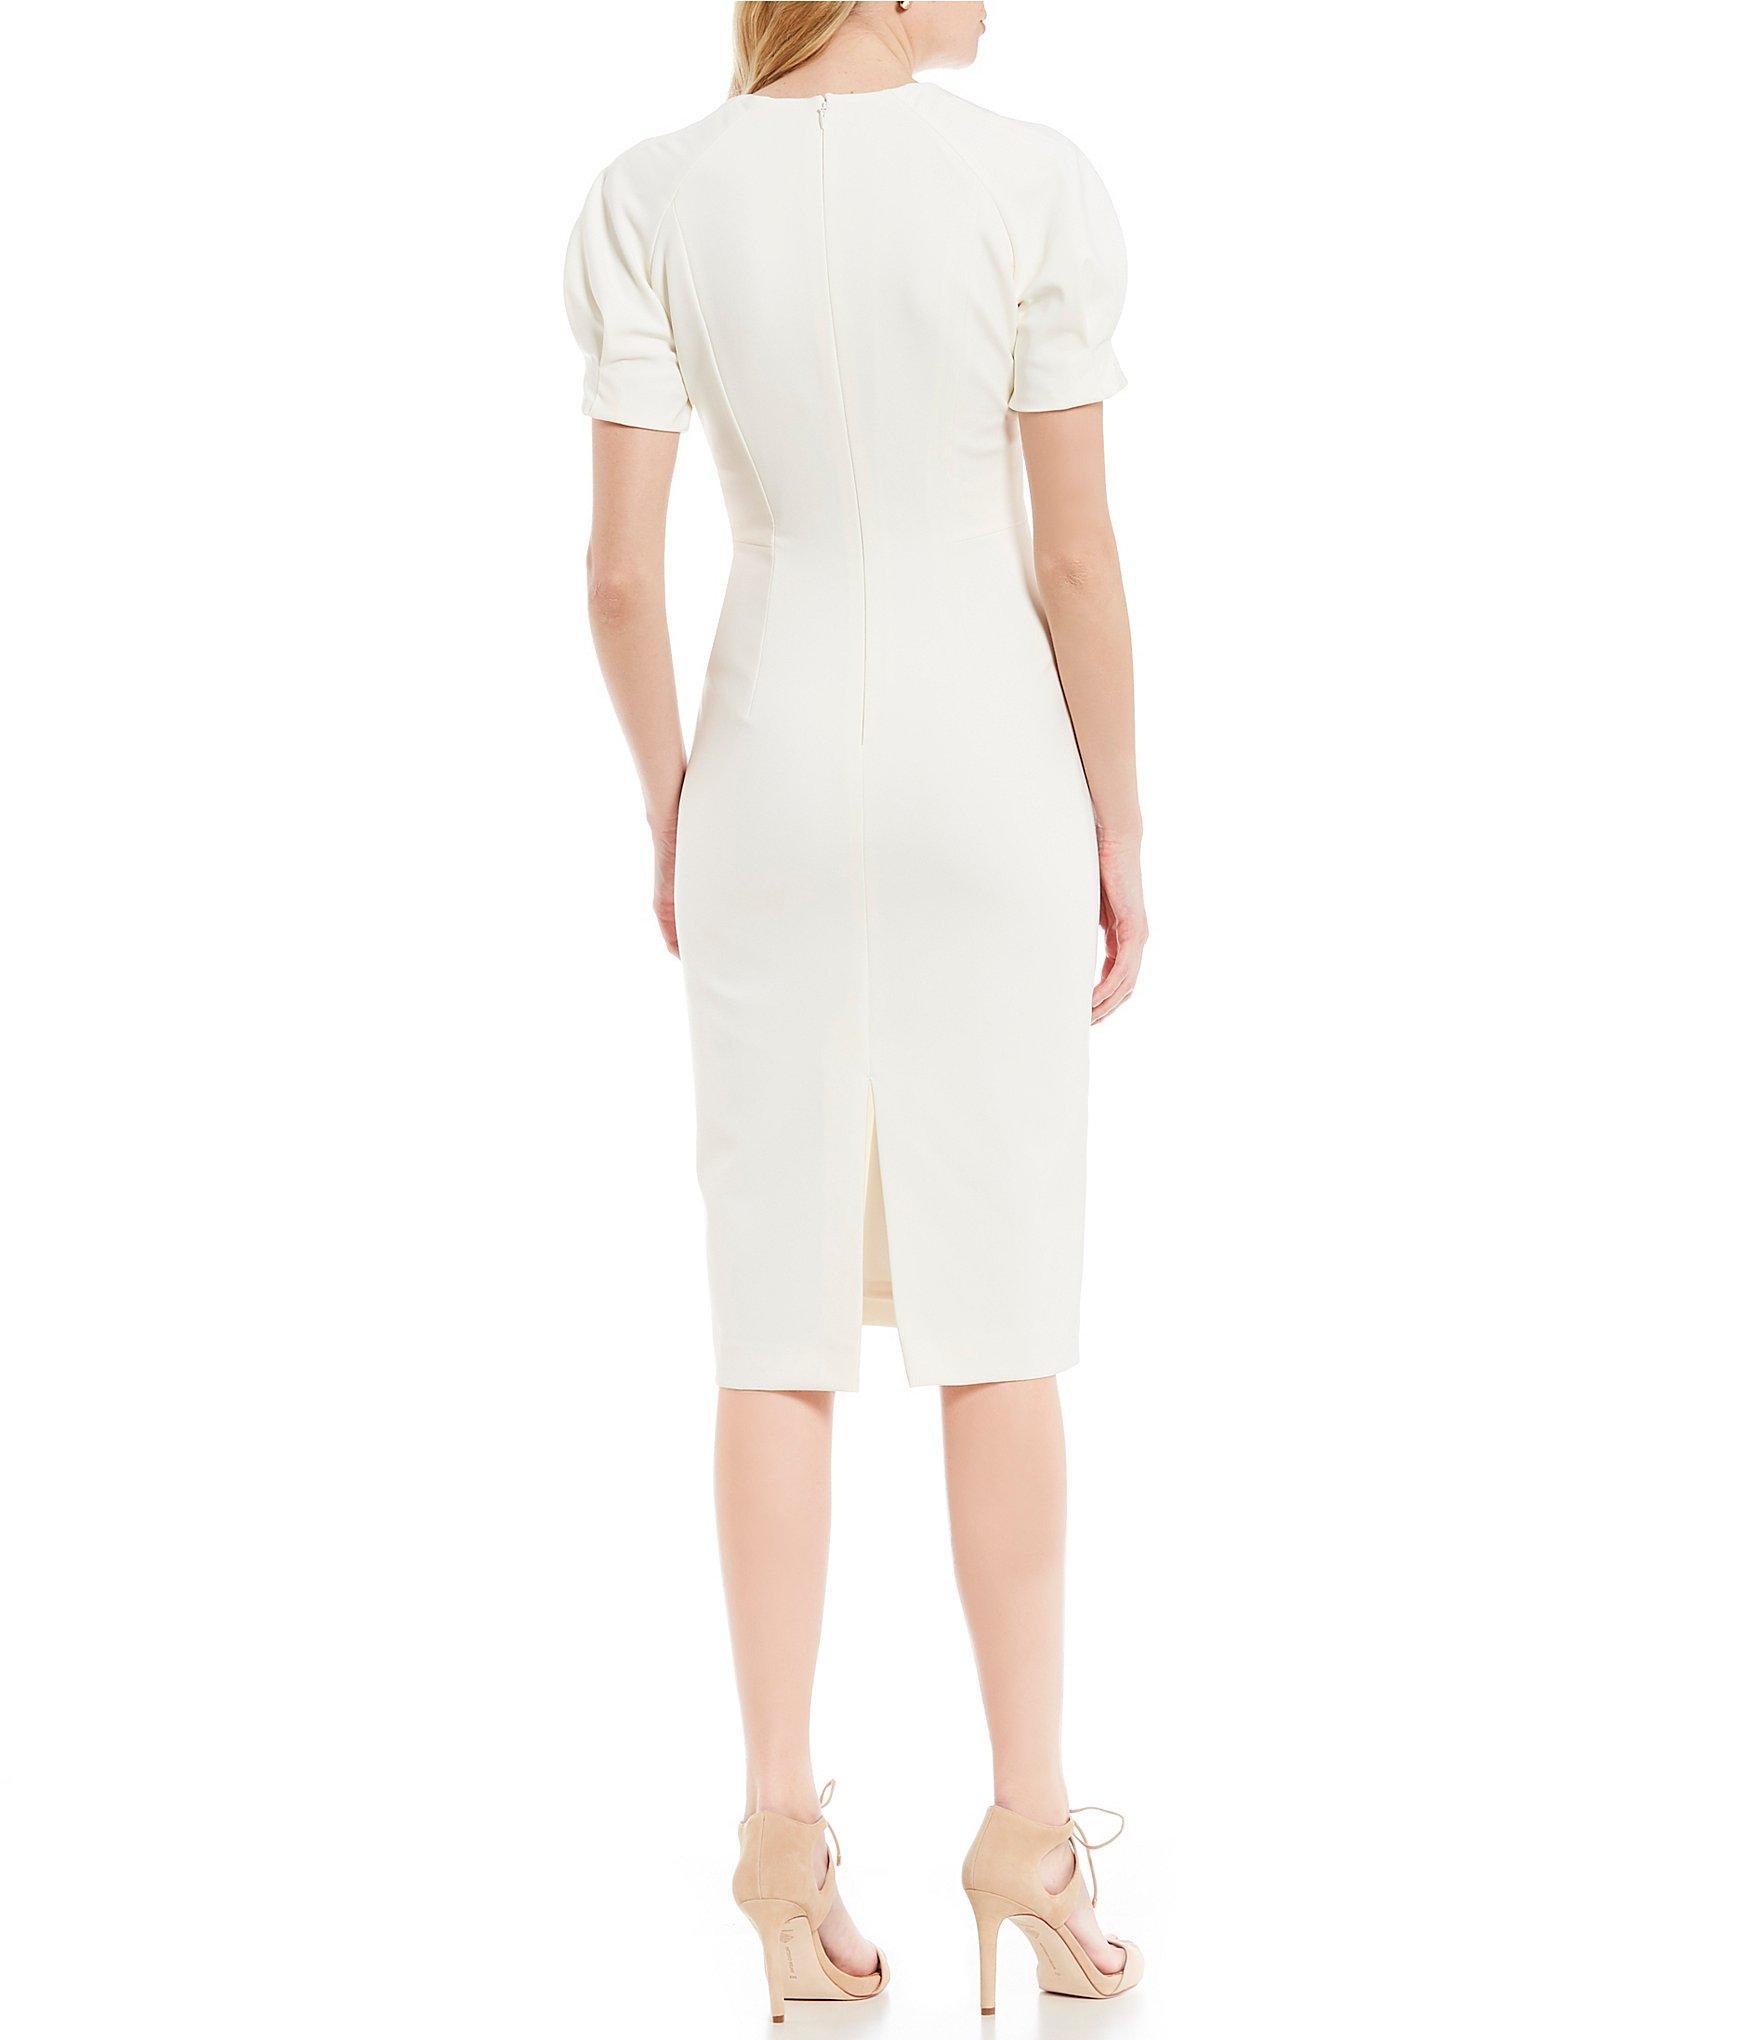 05877b11248a Antonio Melani - White Tania Short Puffy Sleeve V-neck Dress - Lyst. View  fullscreen